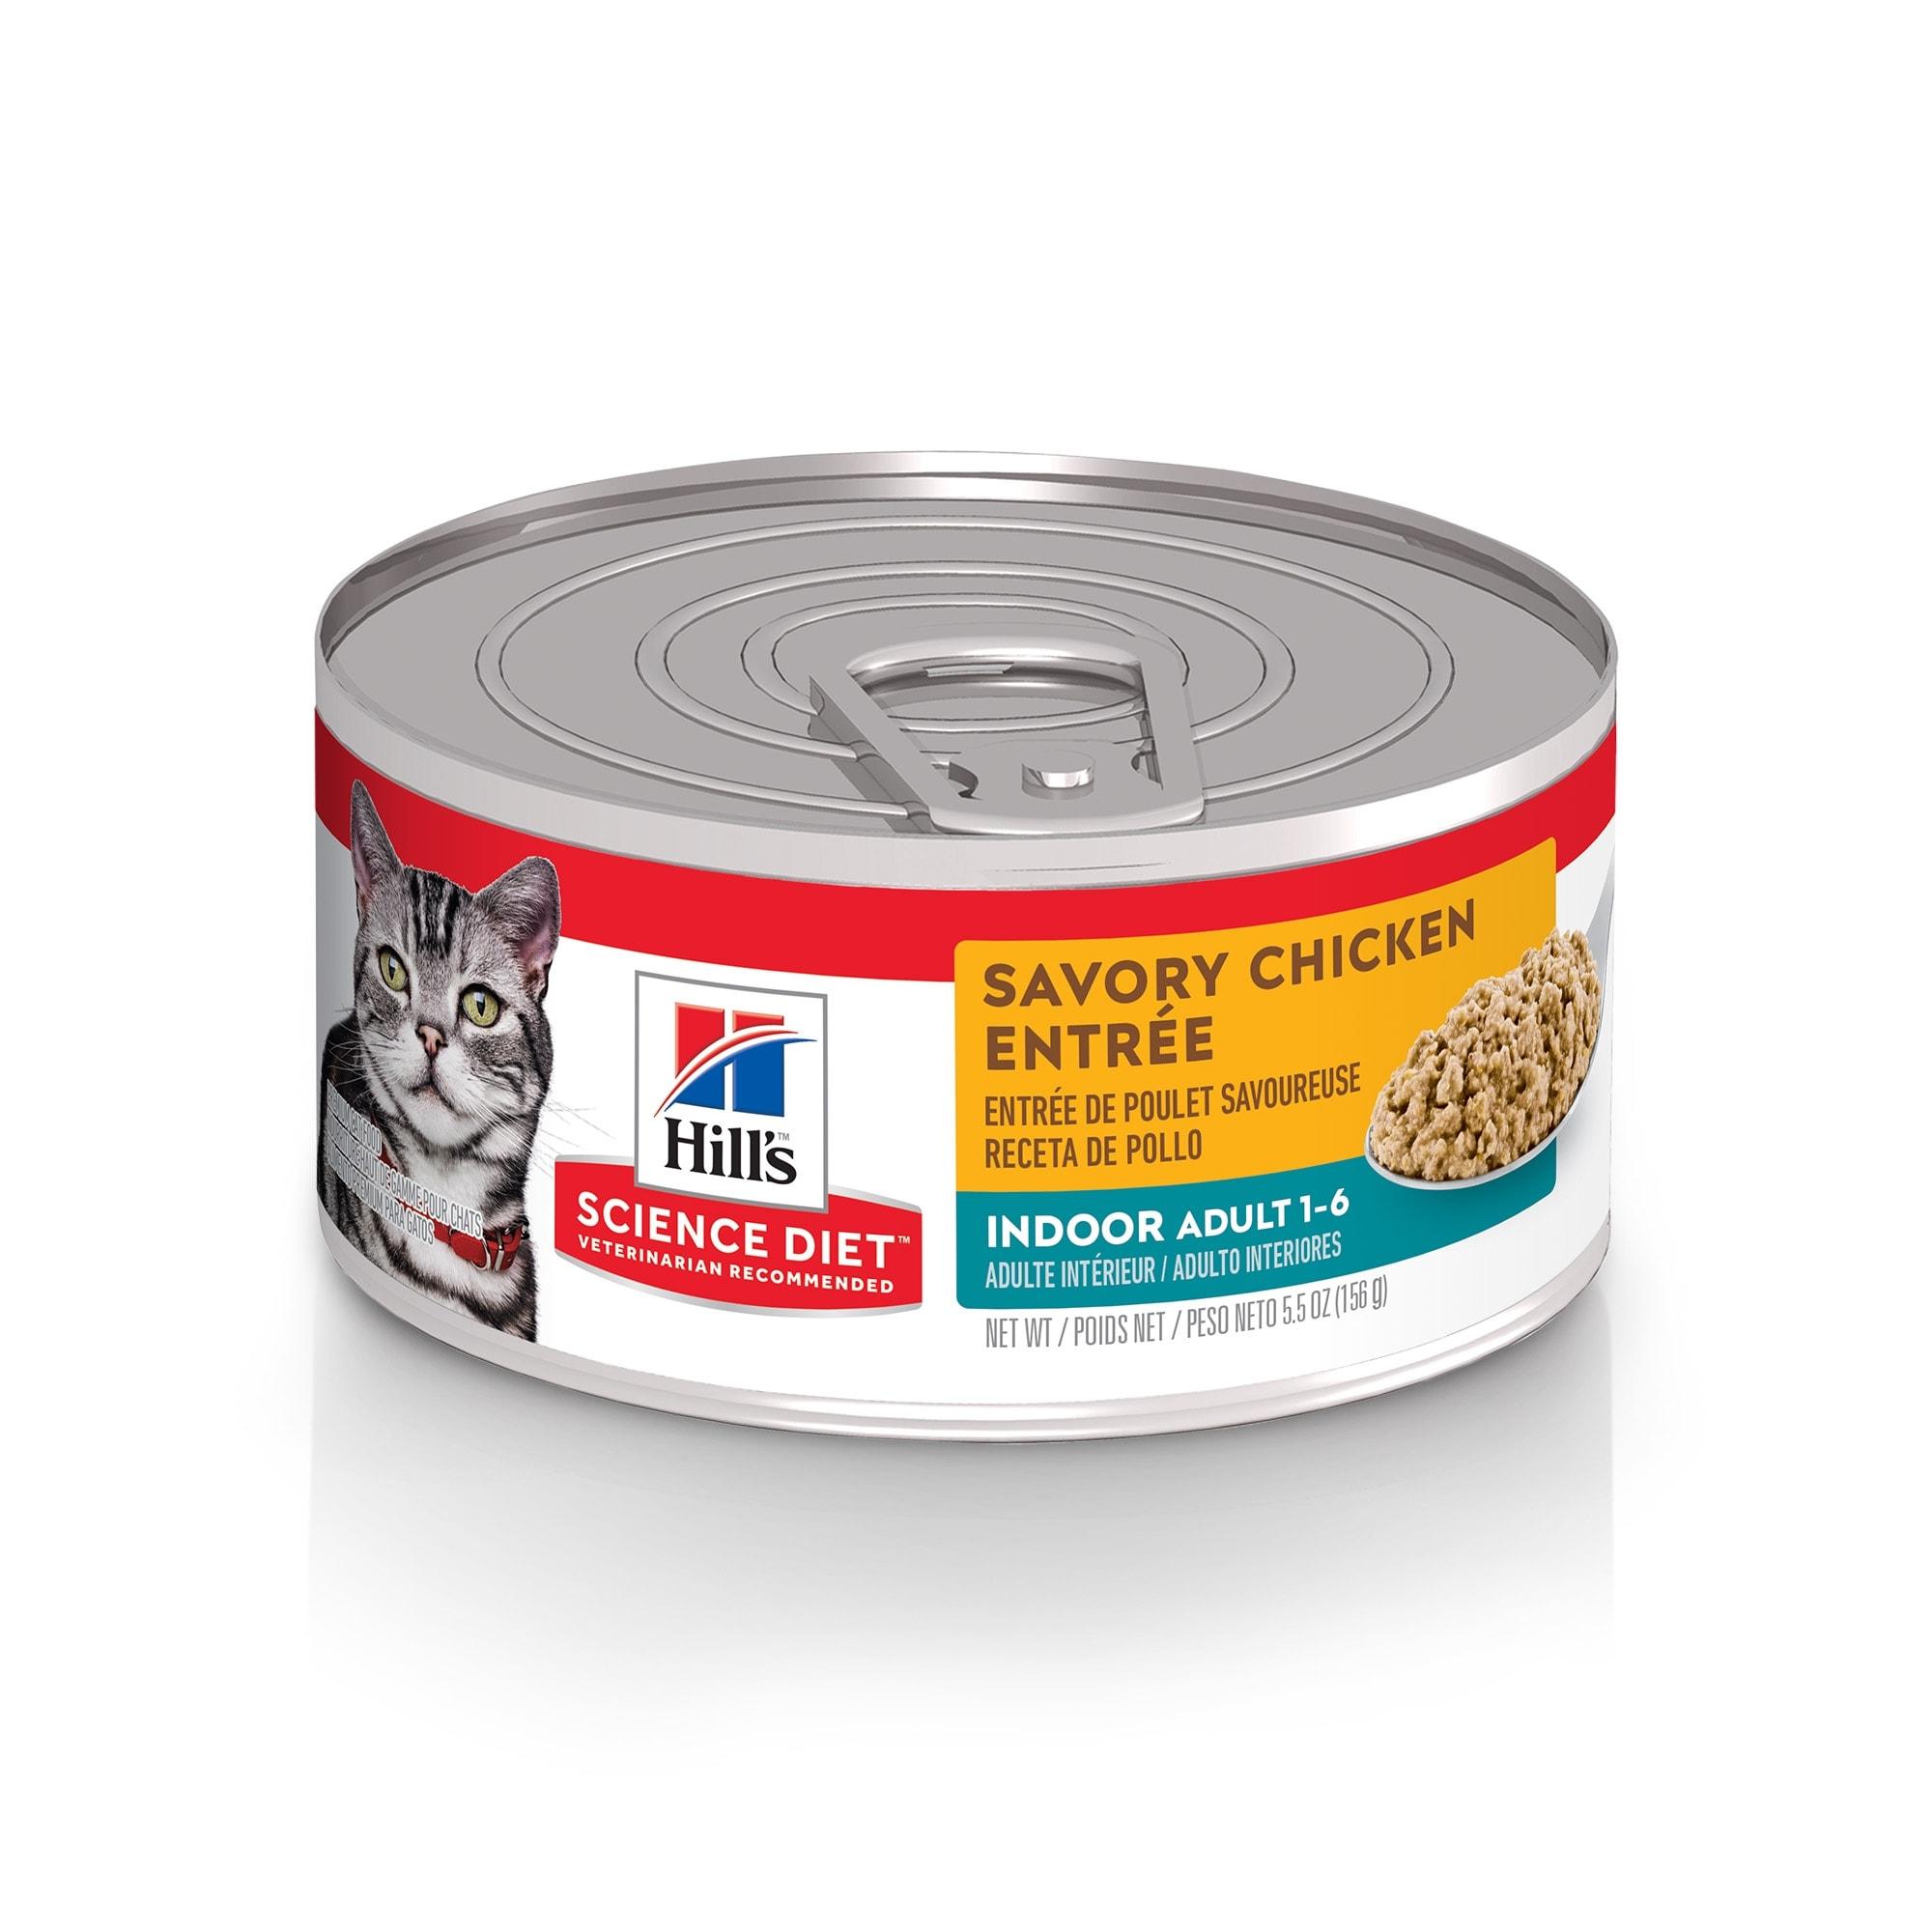 petcoscience diet cat food